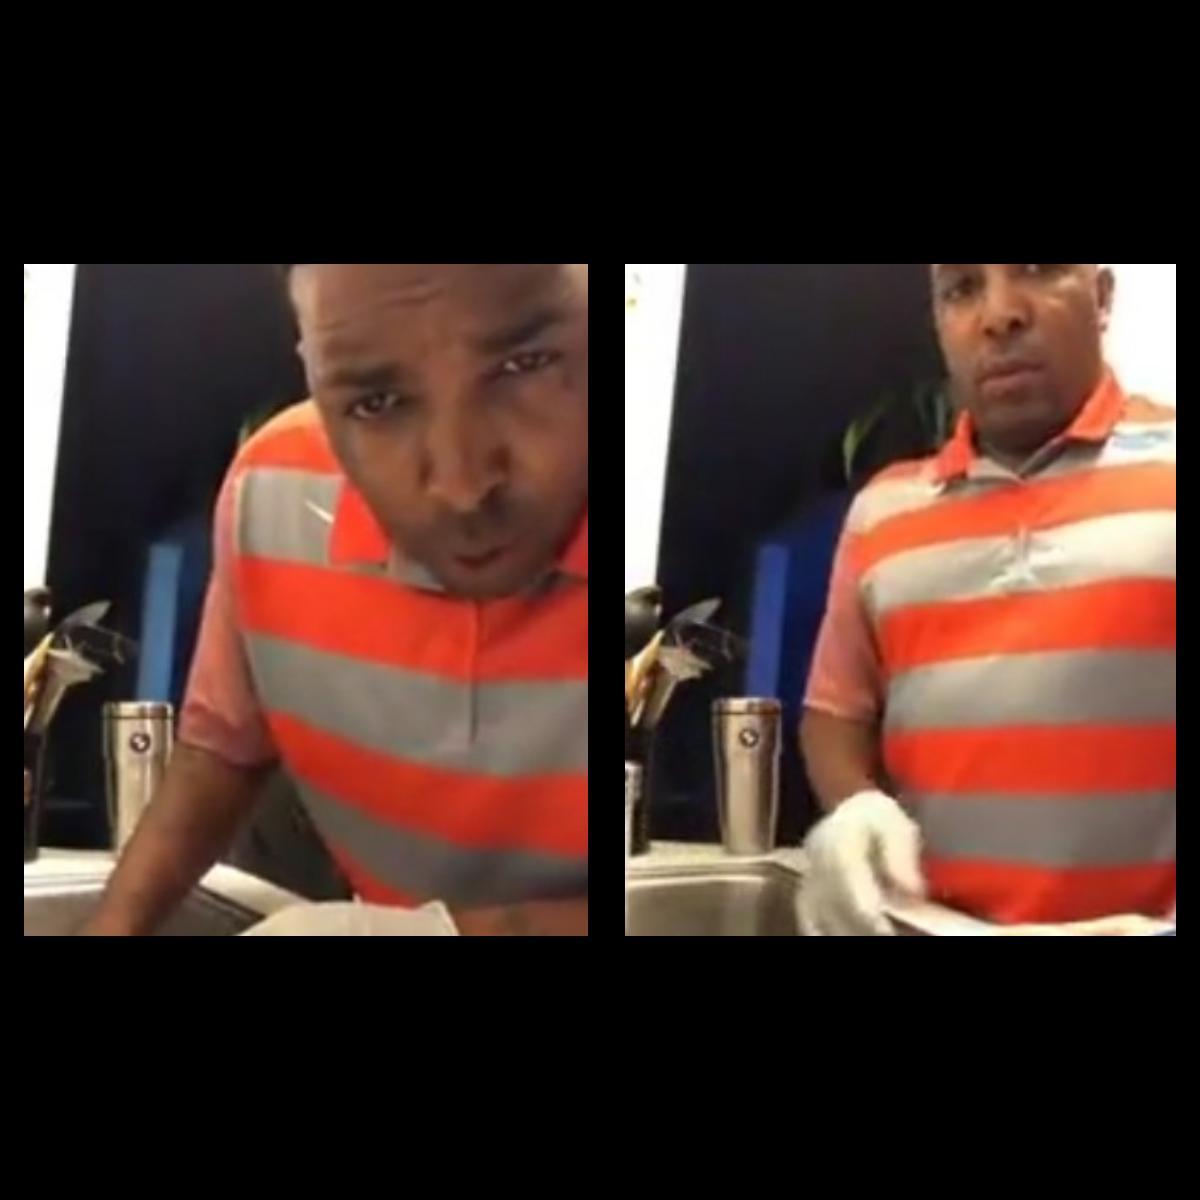 Man Seen Washing Chicken With Dish Washing Liquid